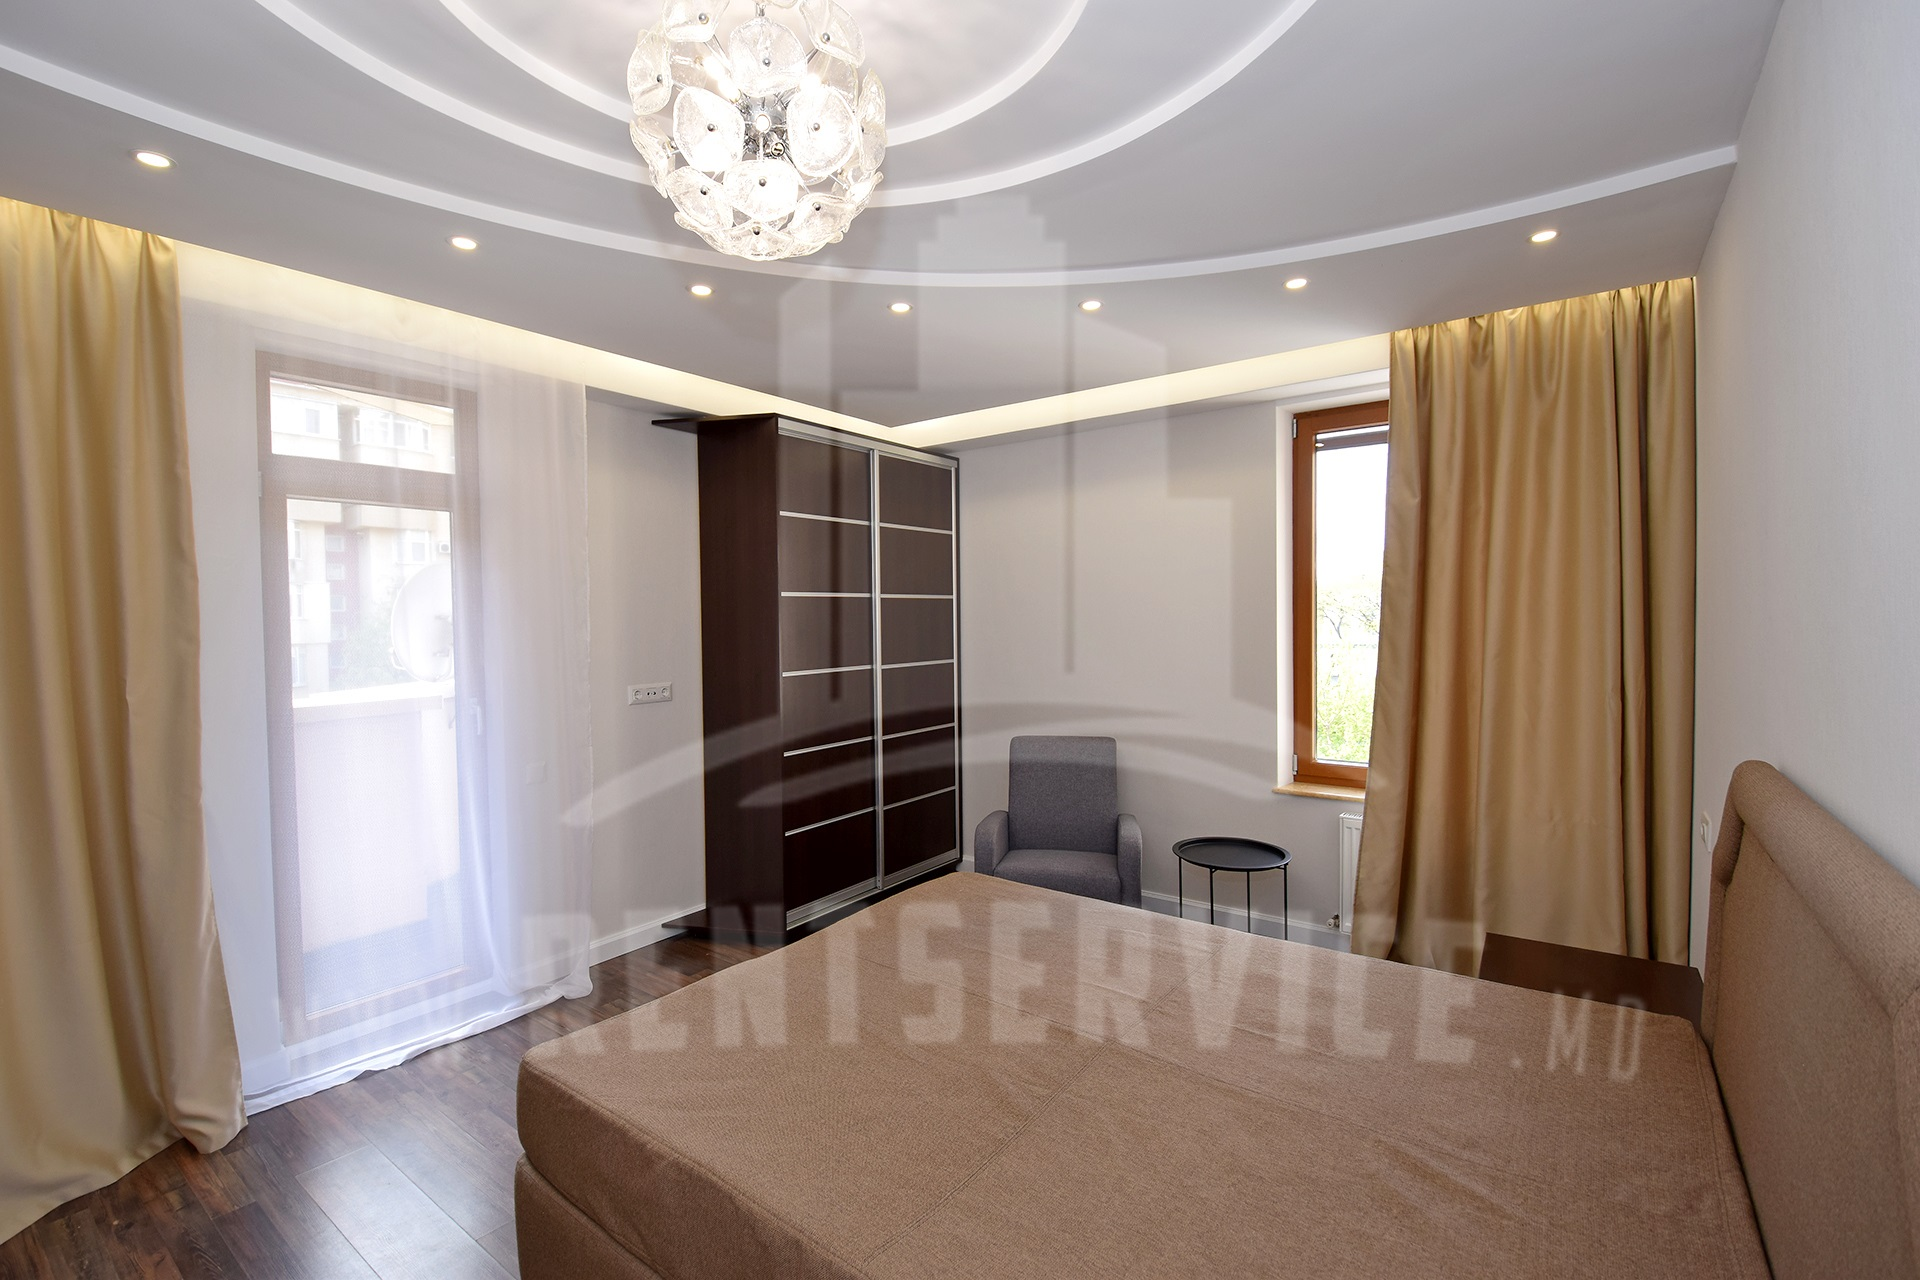 291_apartment_9.JPG